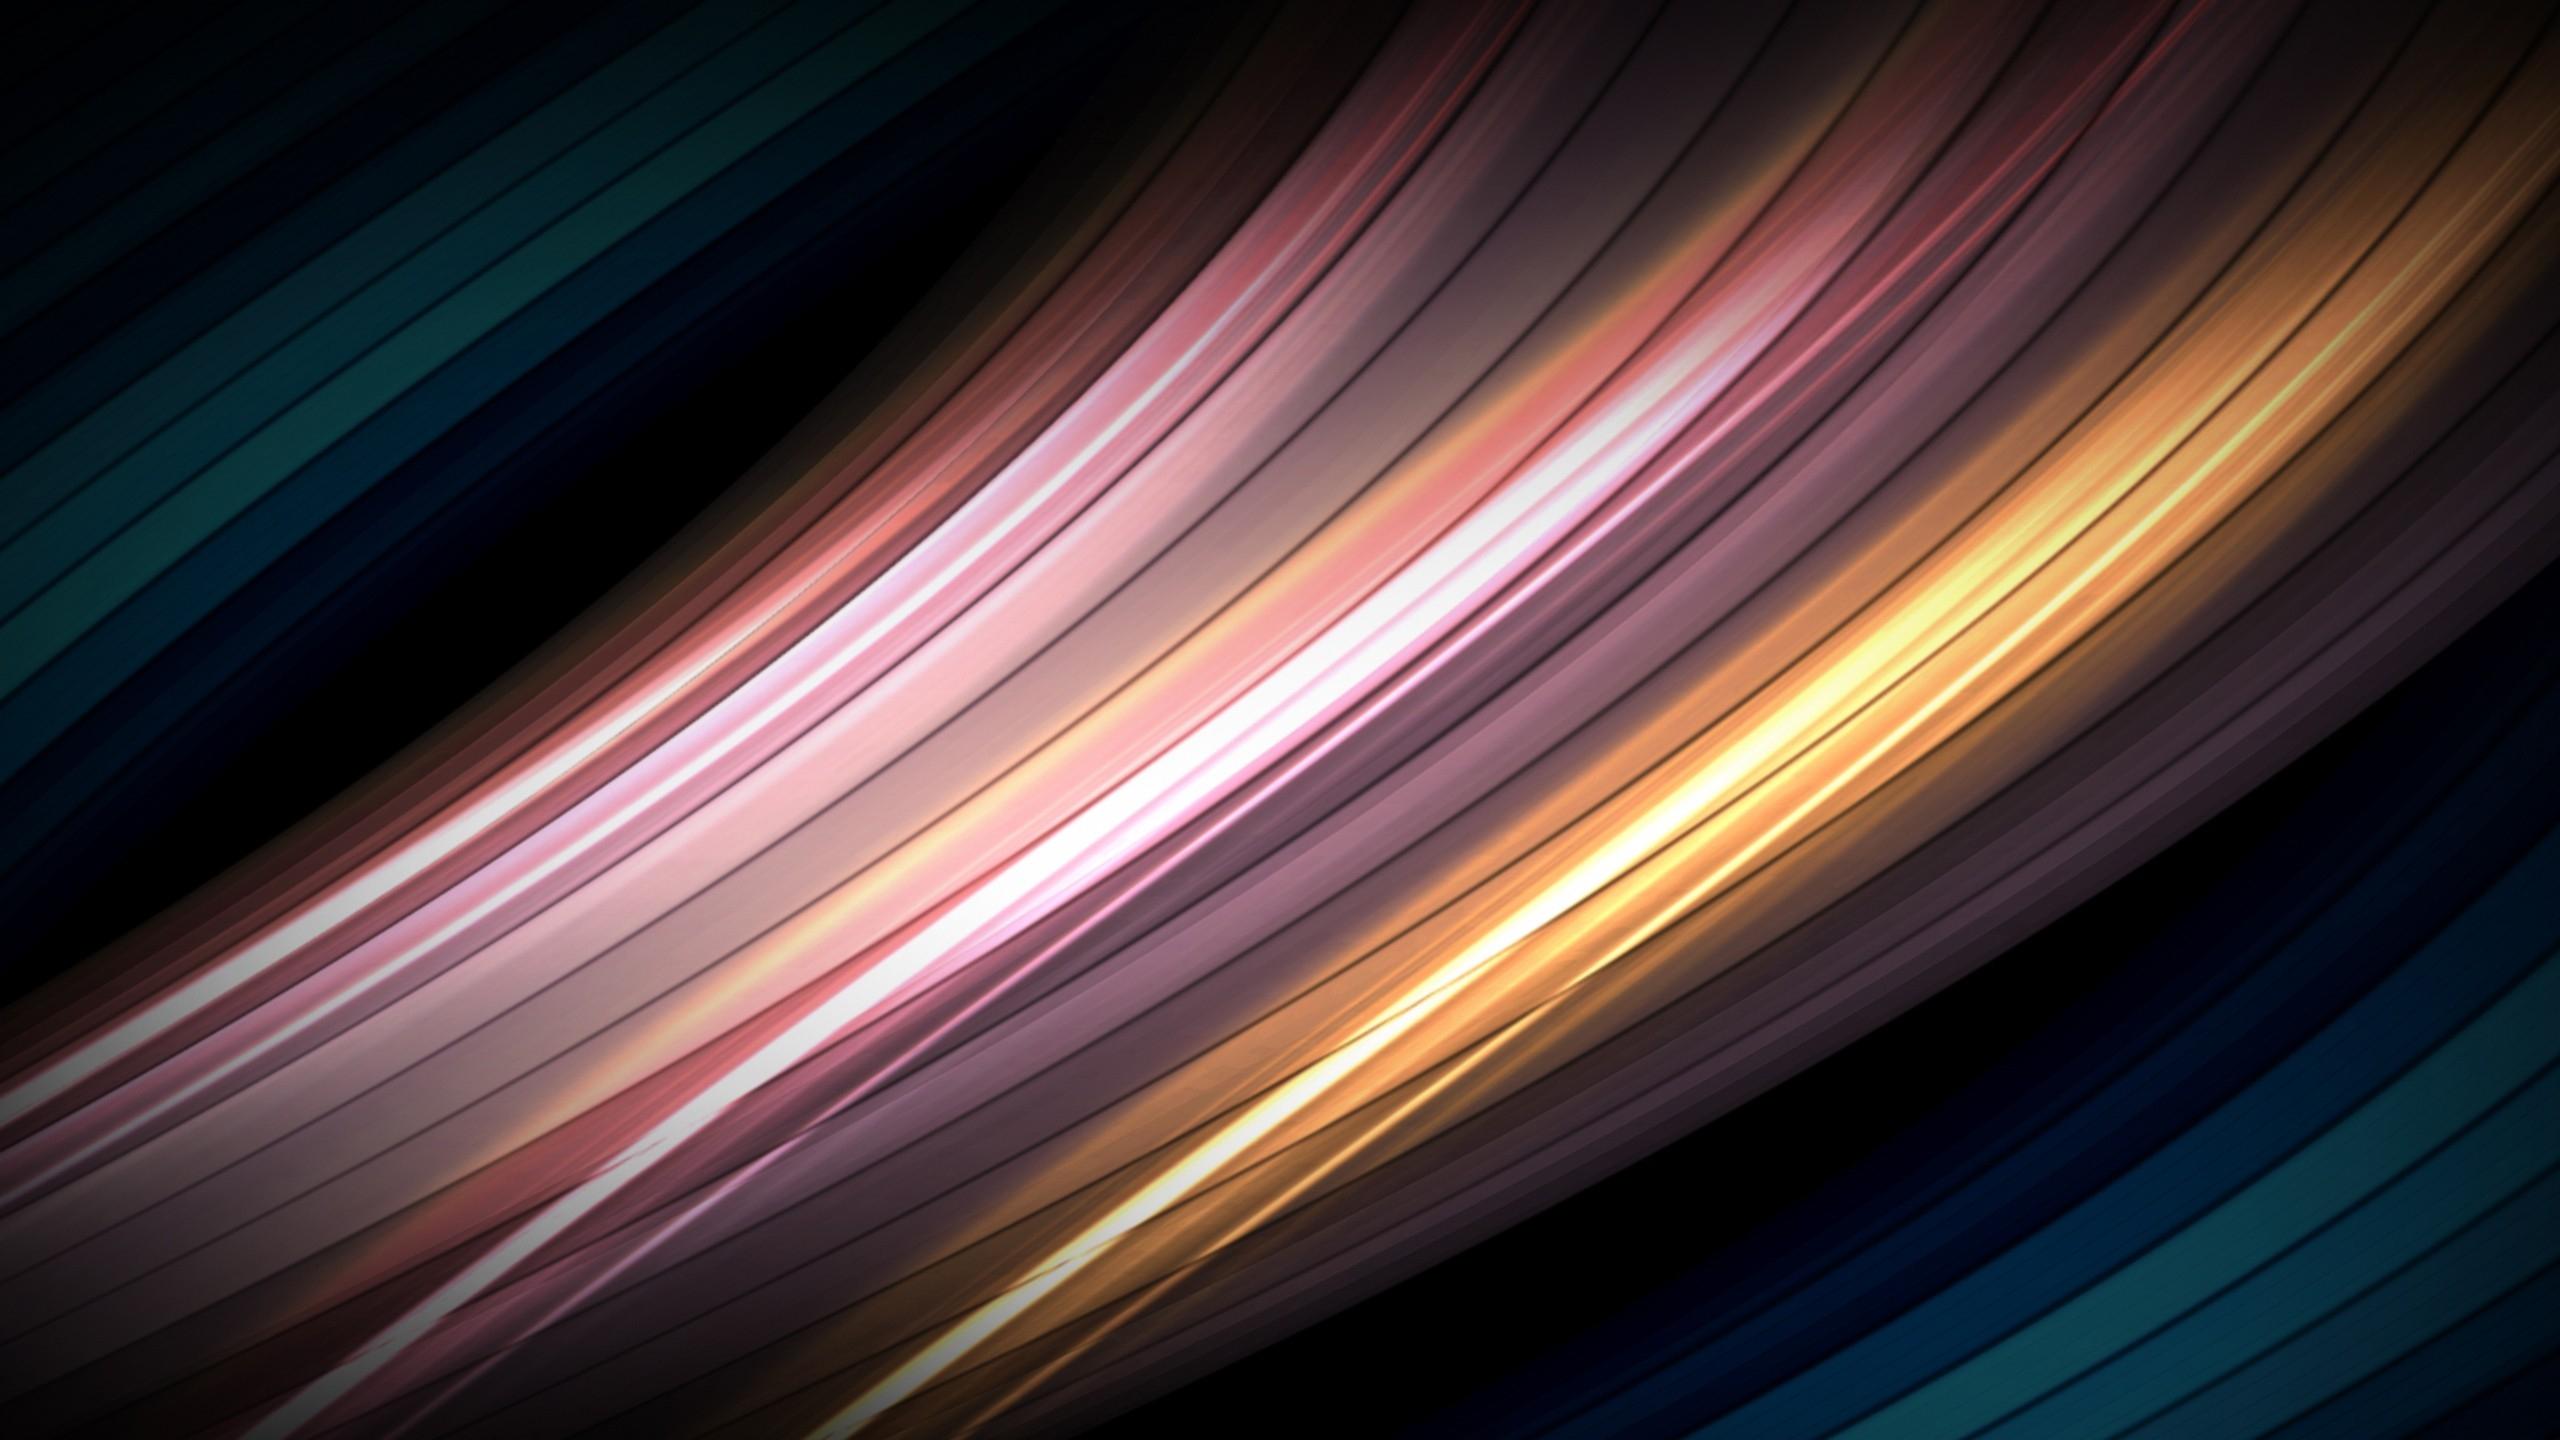 Wallpaper Bands Irregular Shadow Shine 2560x1440 Coolwallpapers 1098236 Hd Wallpapers Wallhere